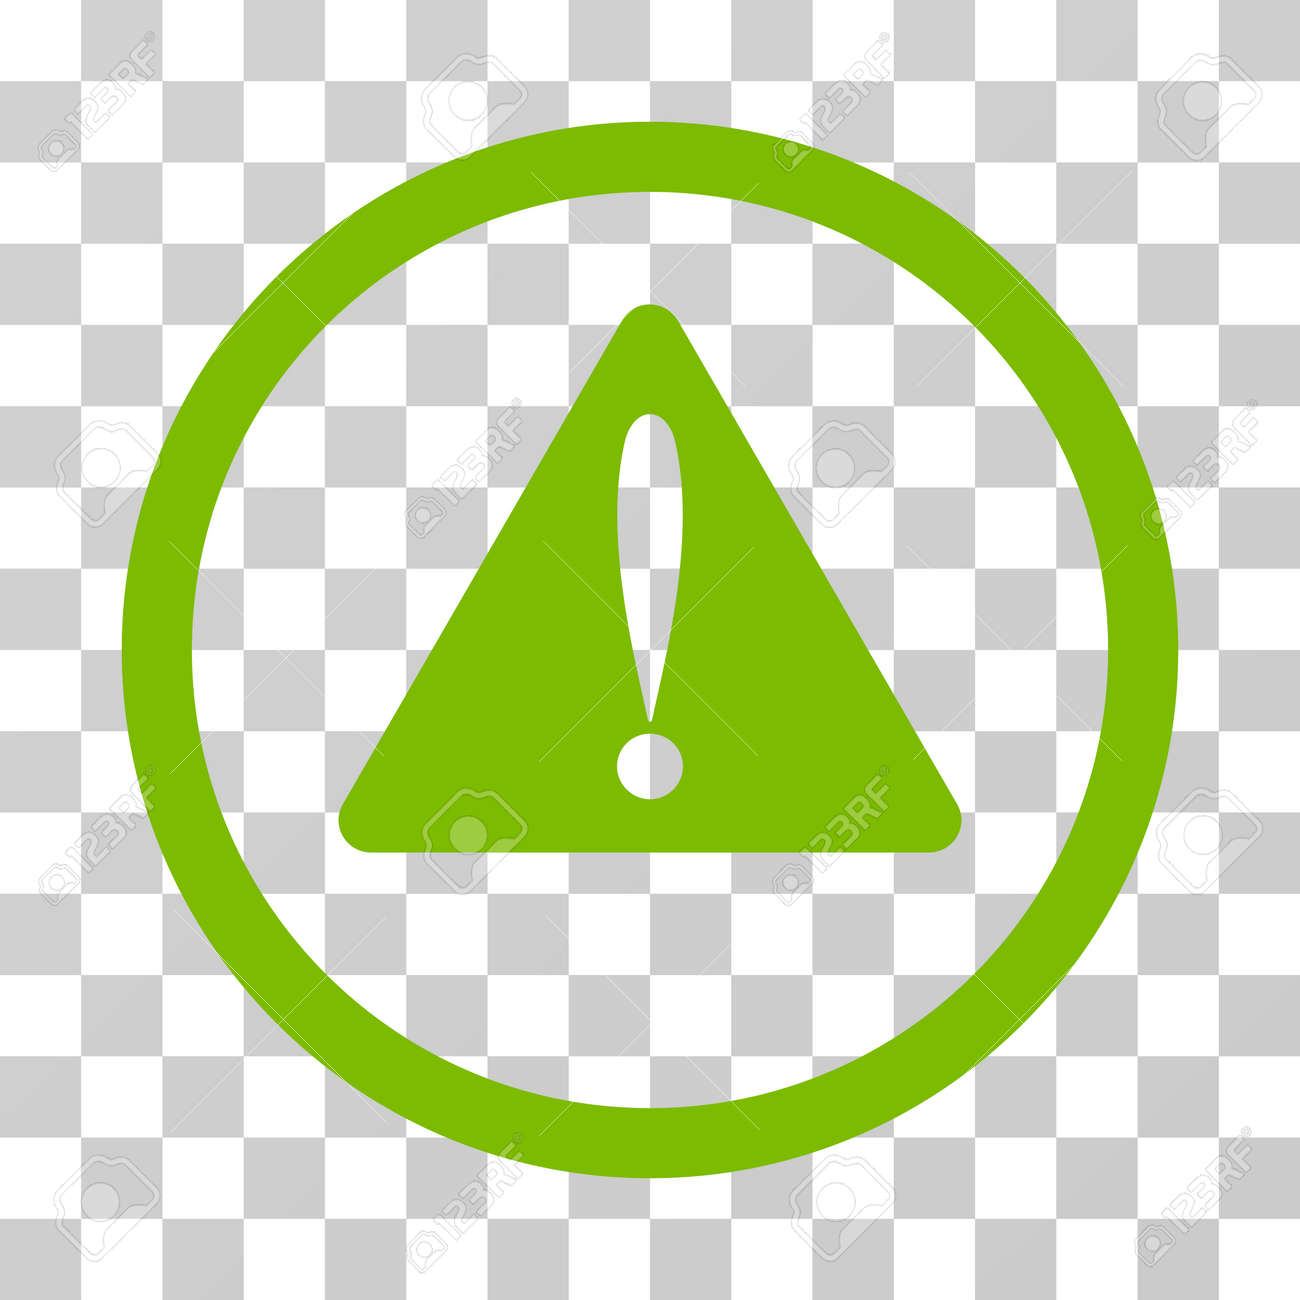 Warning error rounded icon vector illustration style is flat iconic vector illustration style is flat iconic symbol inside a circle buycottarizona Image collections